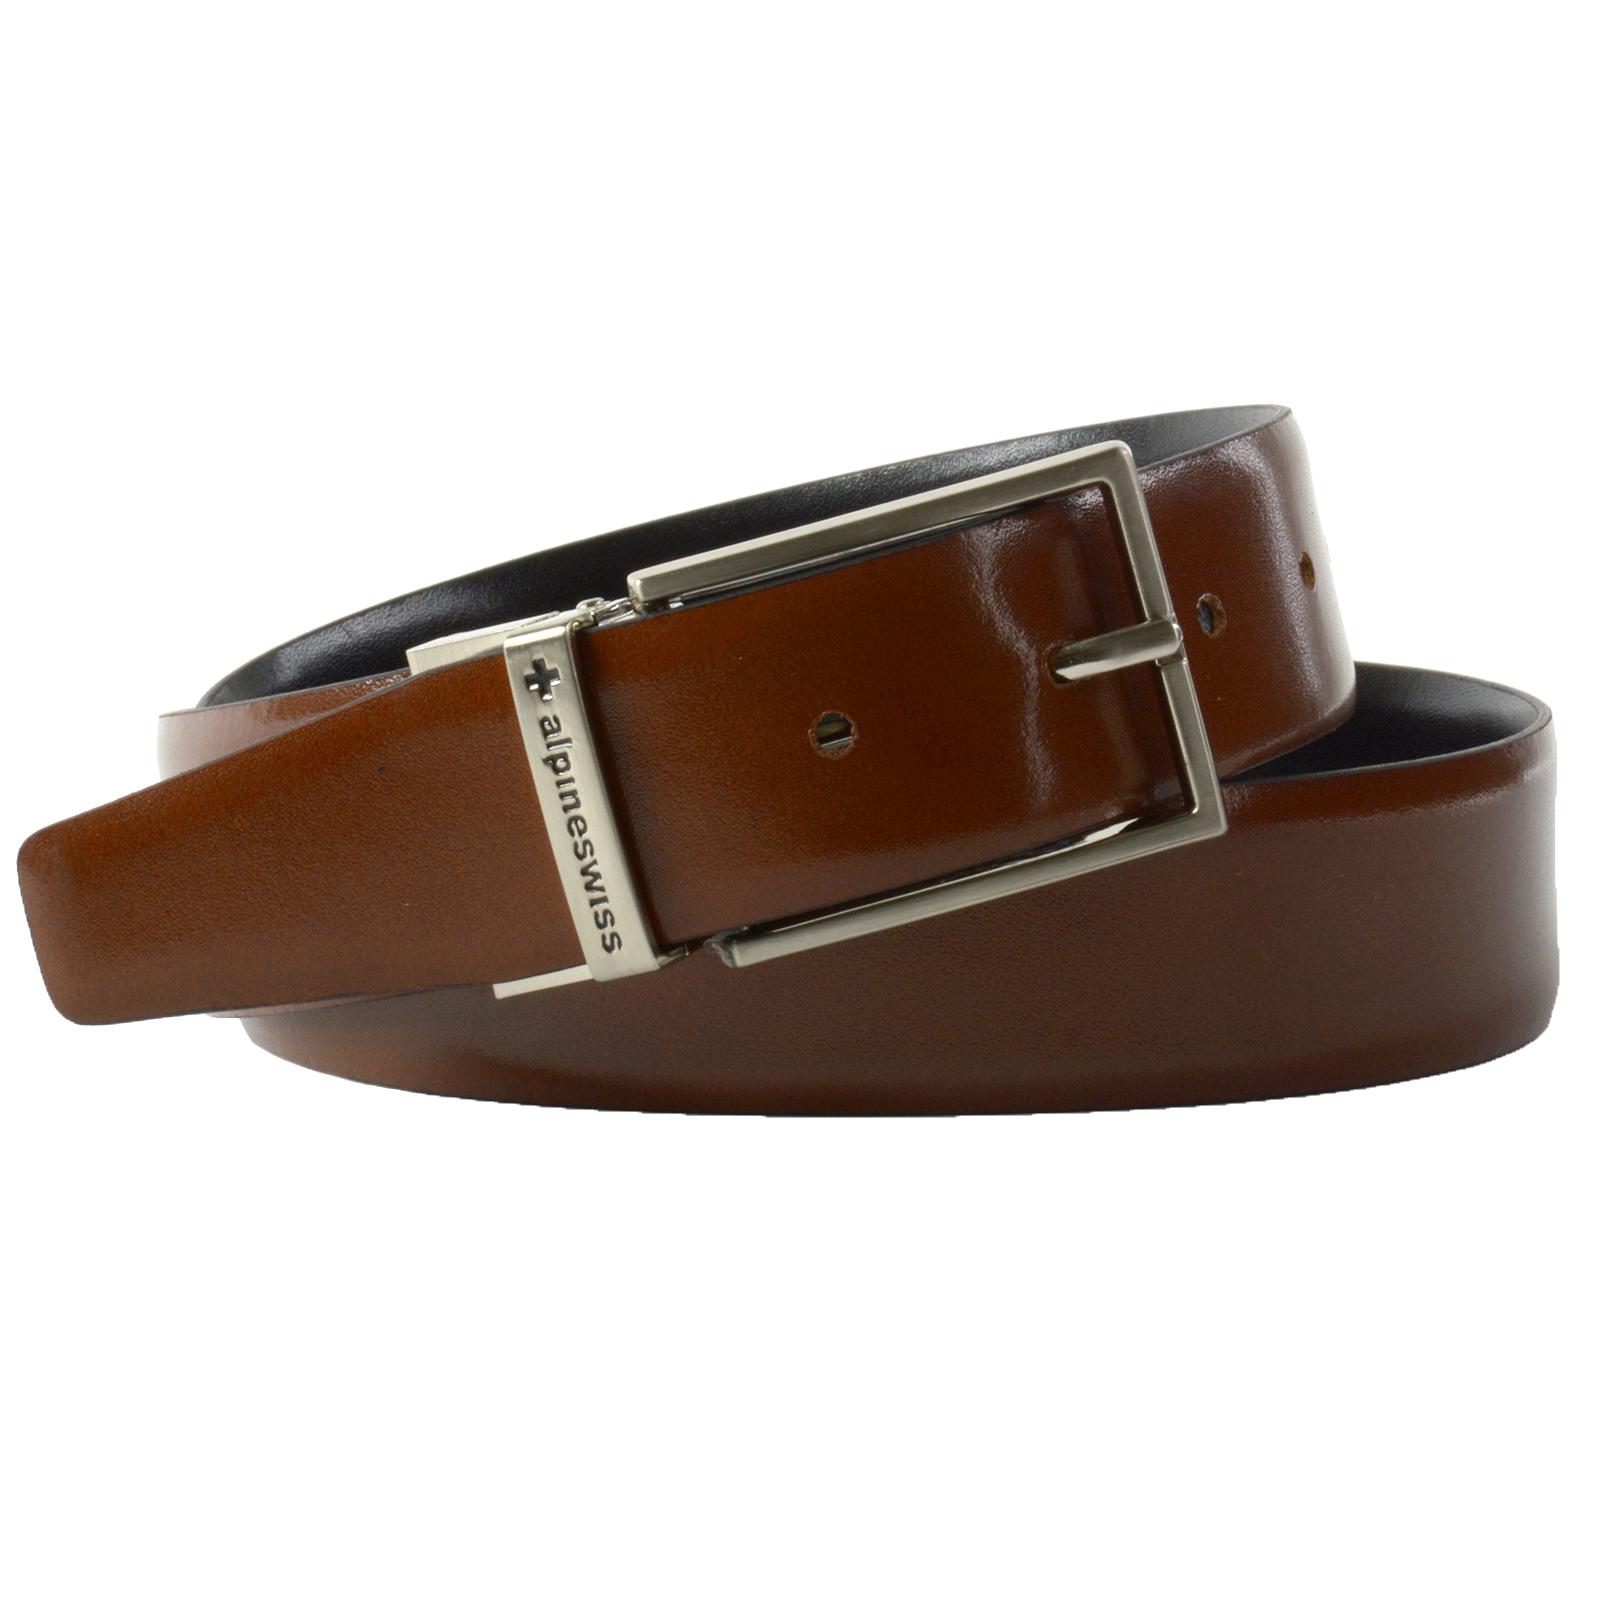 Alpine-Swiss-Men-039-s-Dress-Belt-Reversible-Black-Brown-Leather-Imported-from-Spain